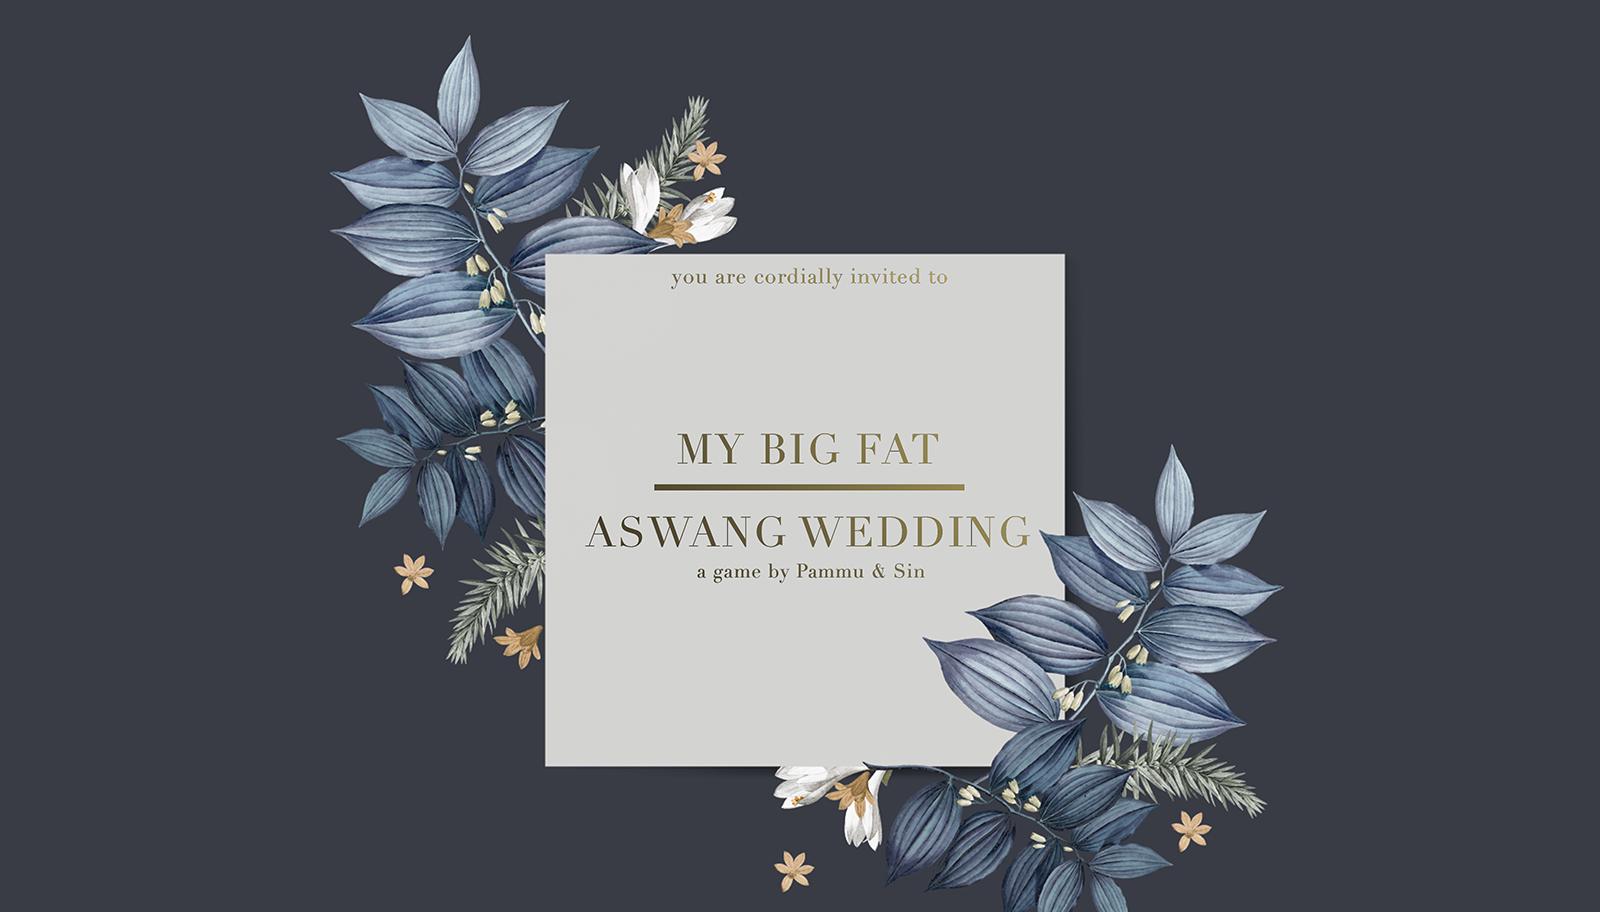 My Big Fat Aswang Wedding